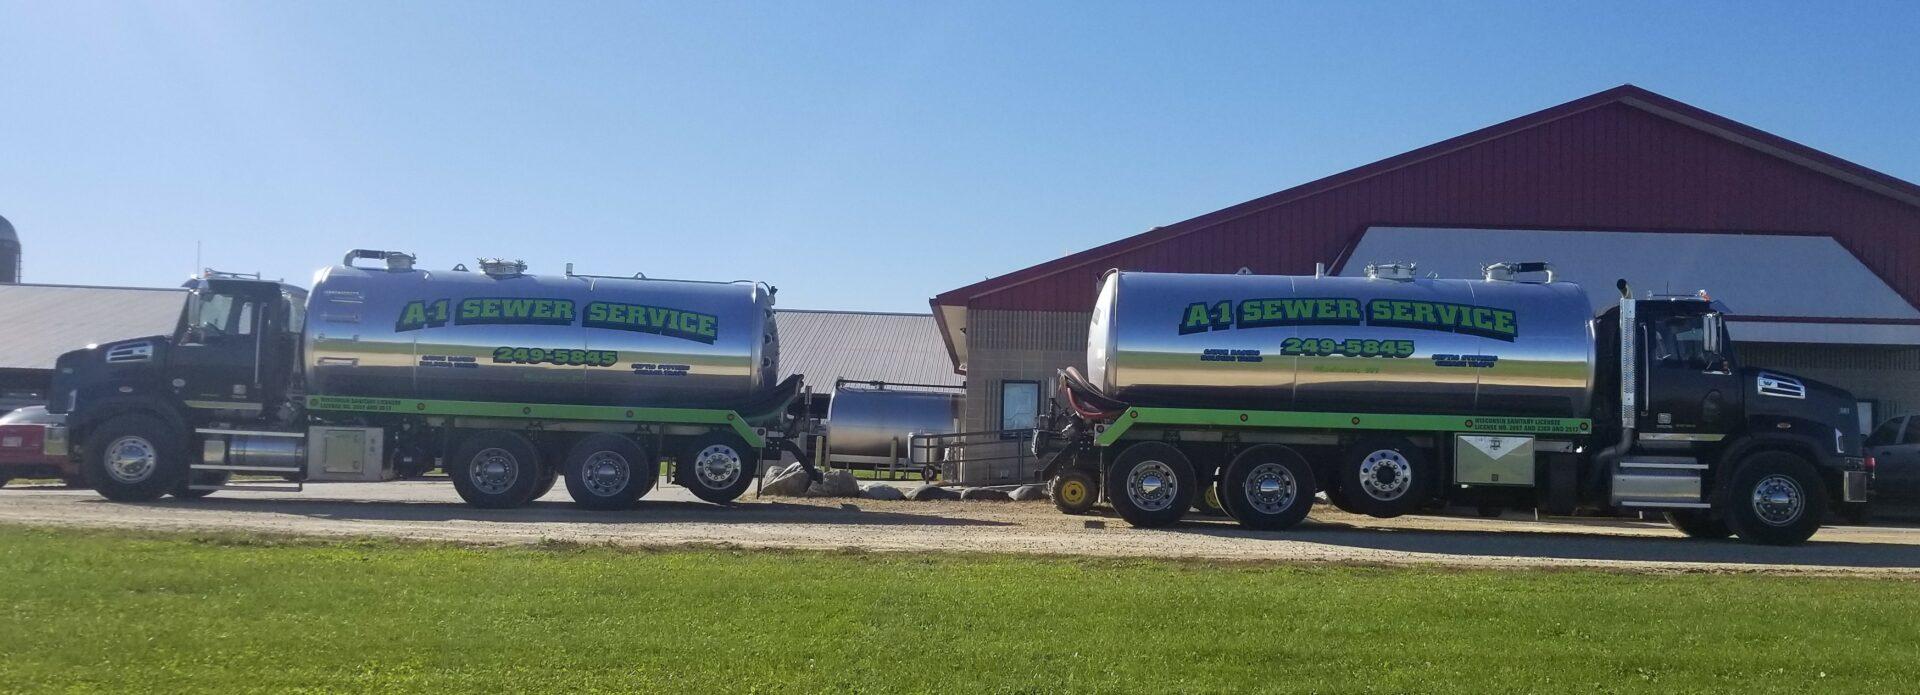 2 new trucks